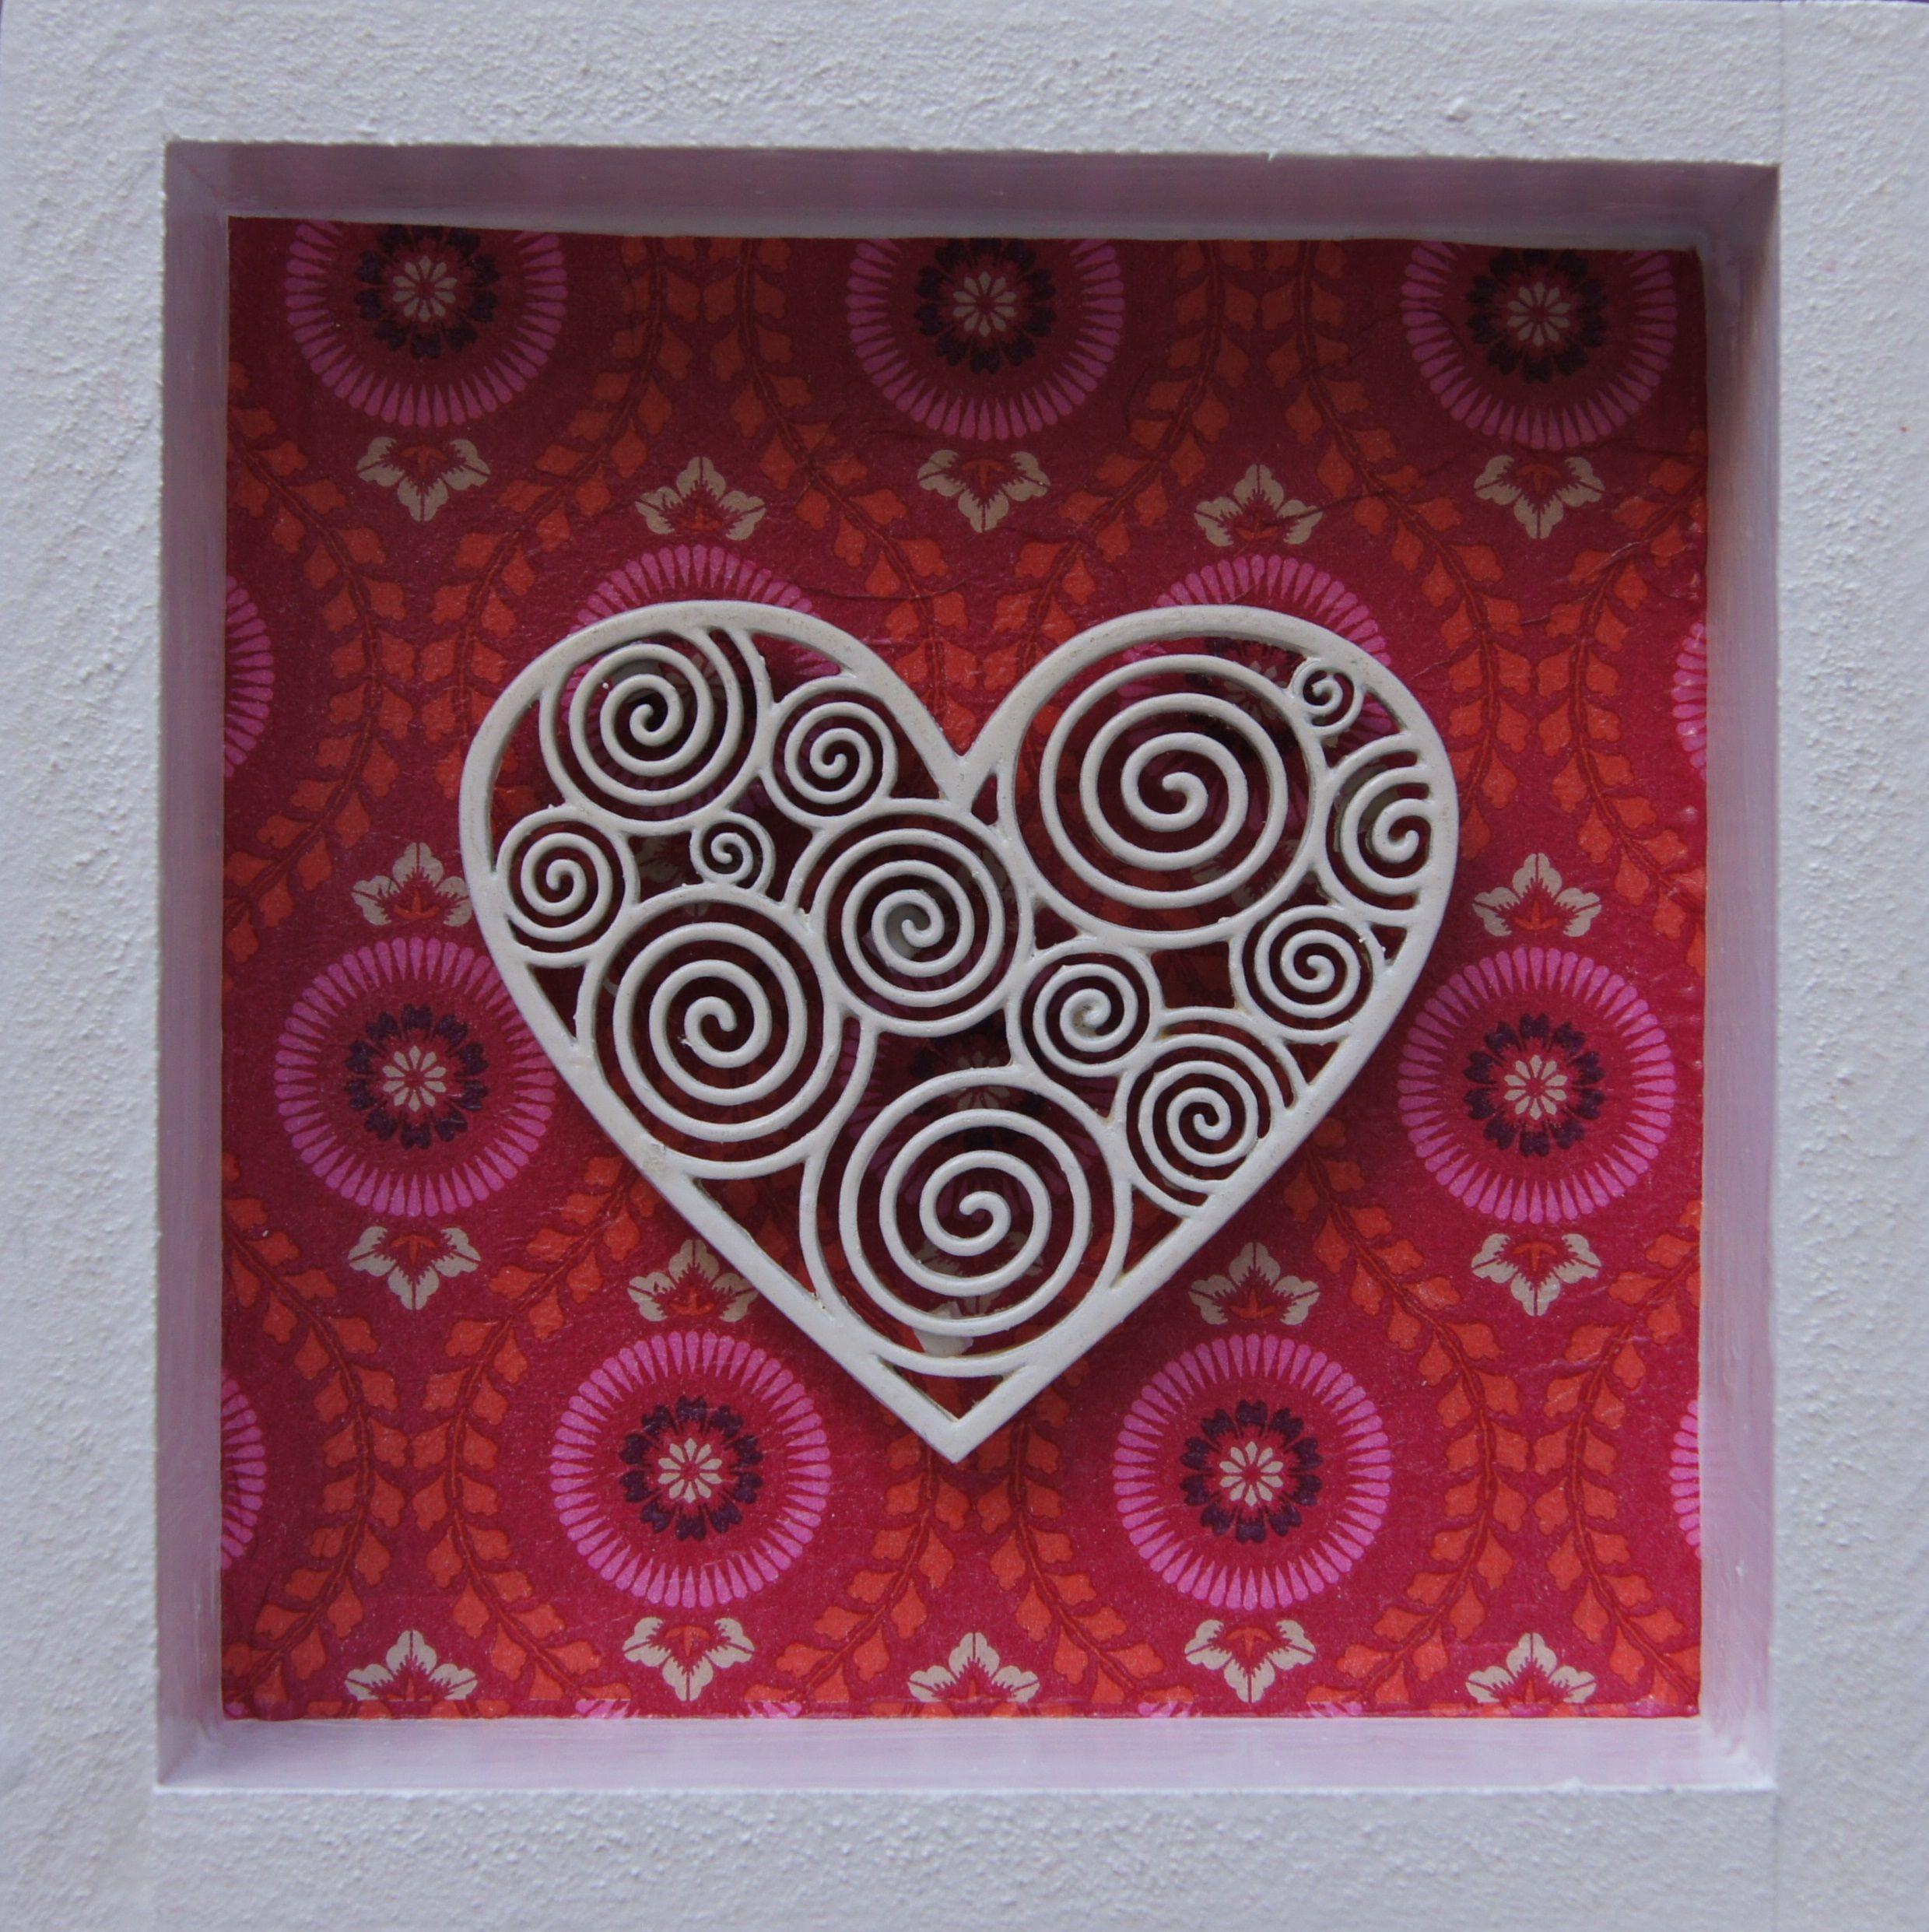 Corazón | Cuadros decoupage | Pinterest | Cuadro, Peinetas y Siluetas